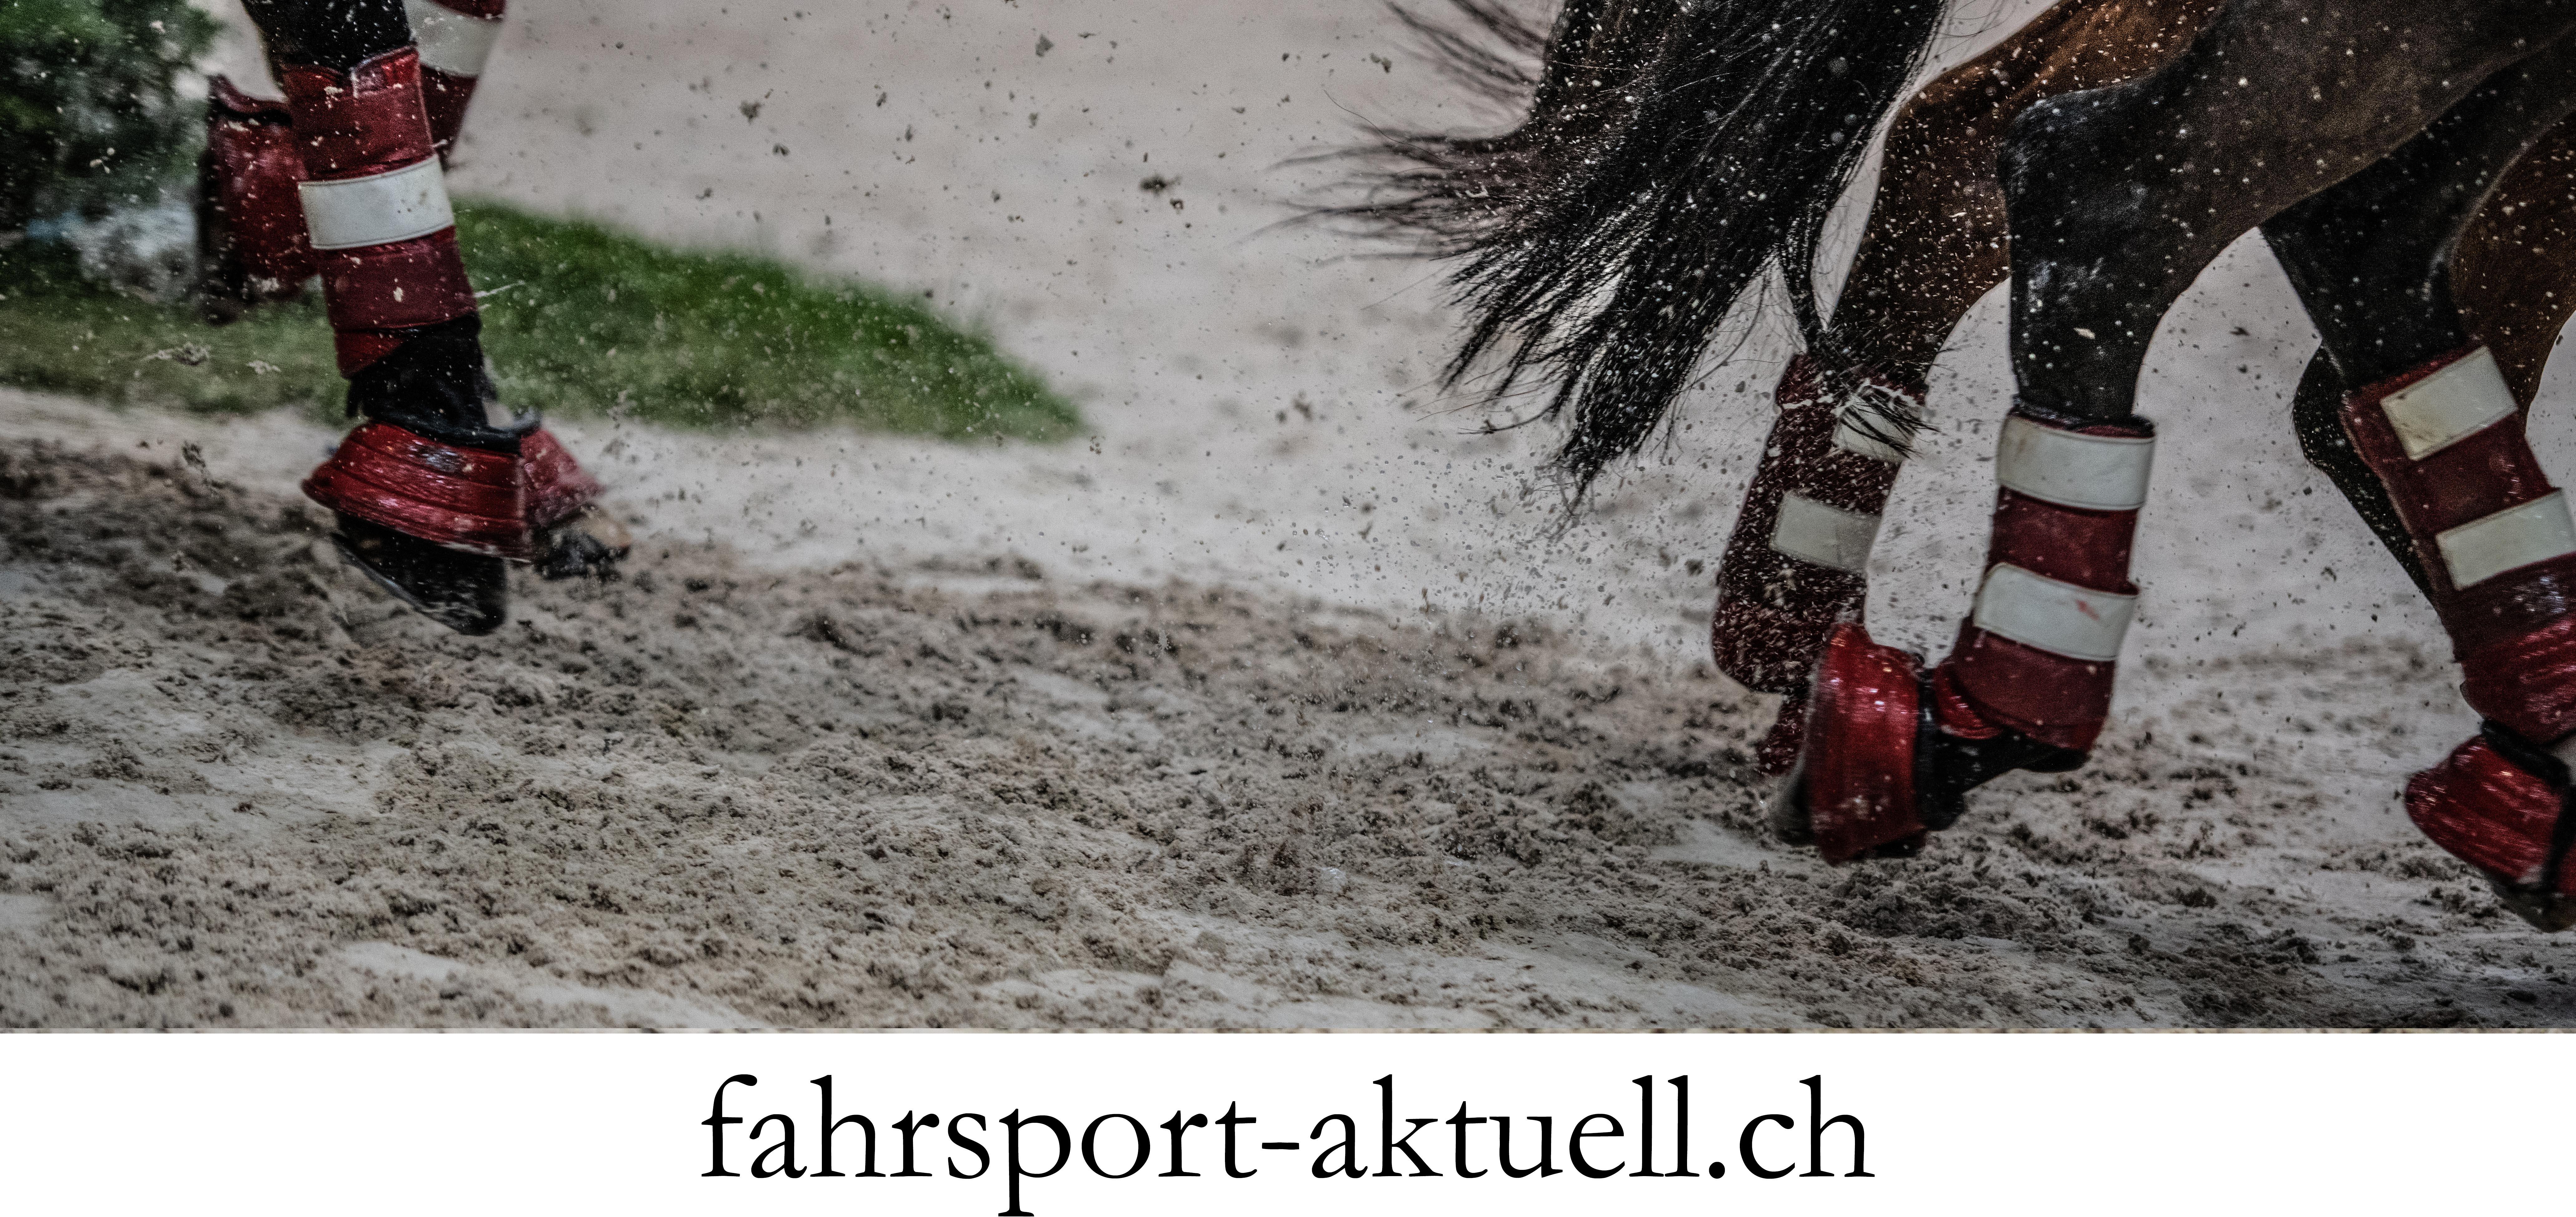 fahrsport-aktuell.ch